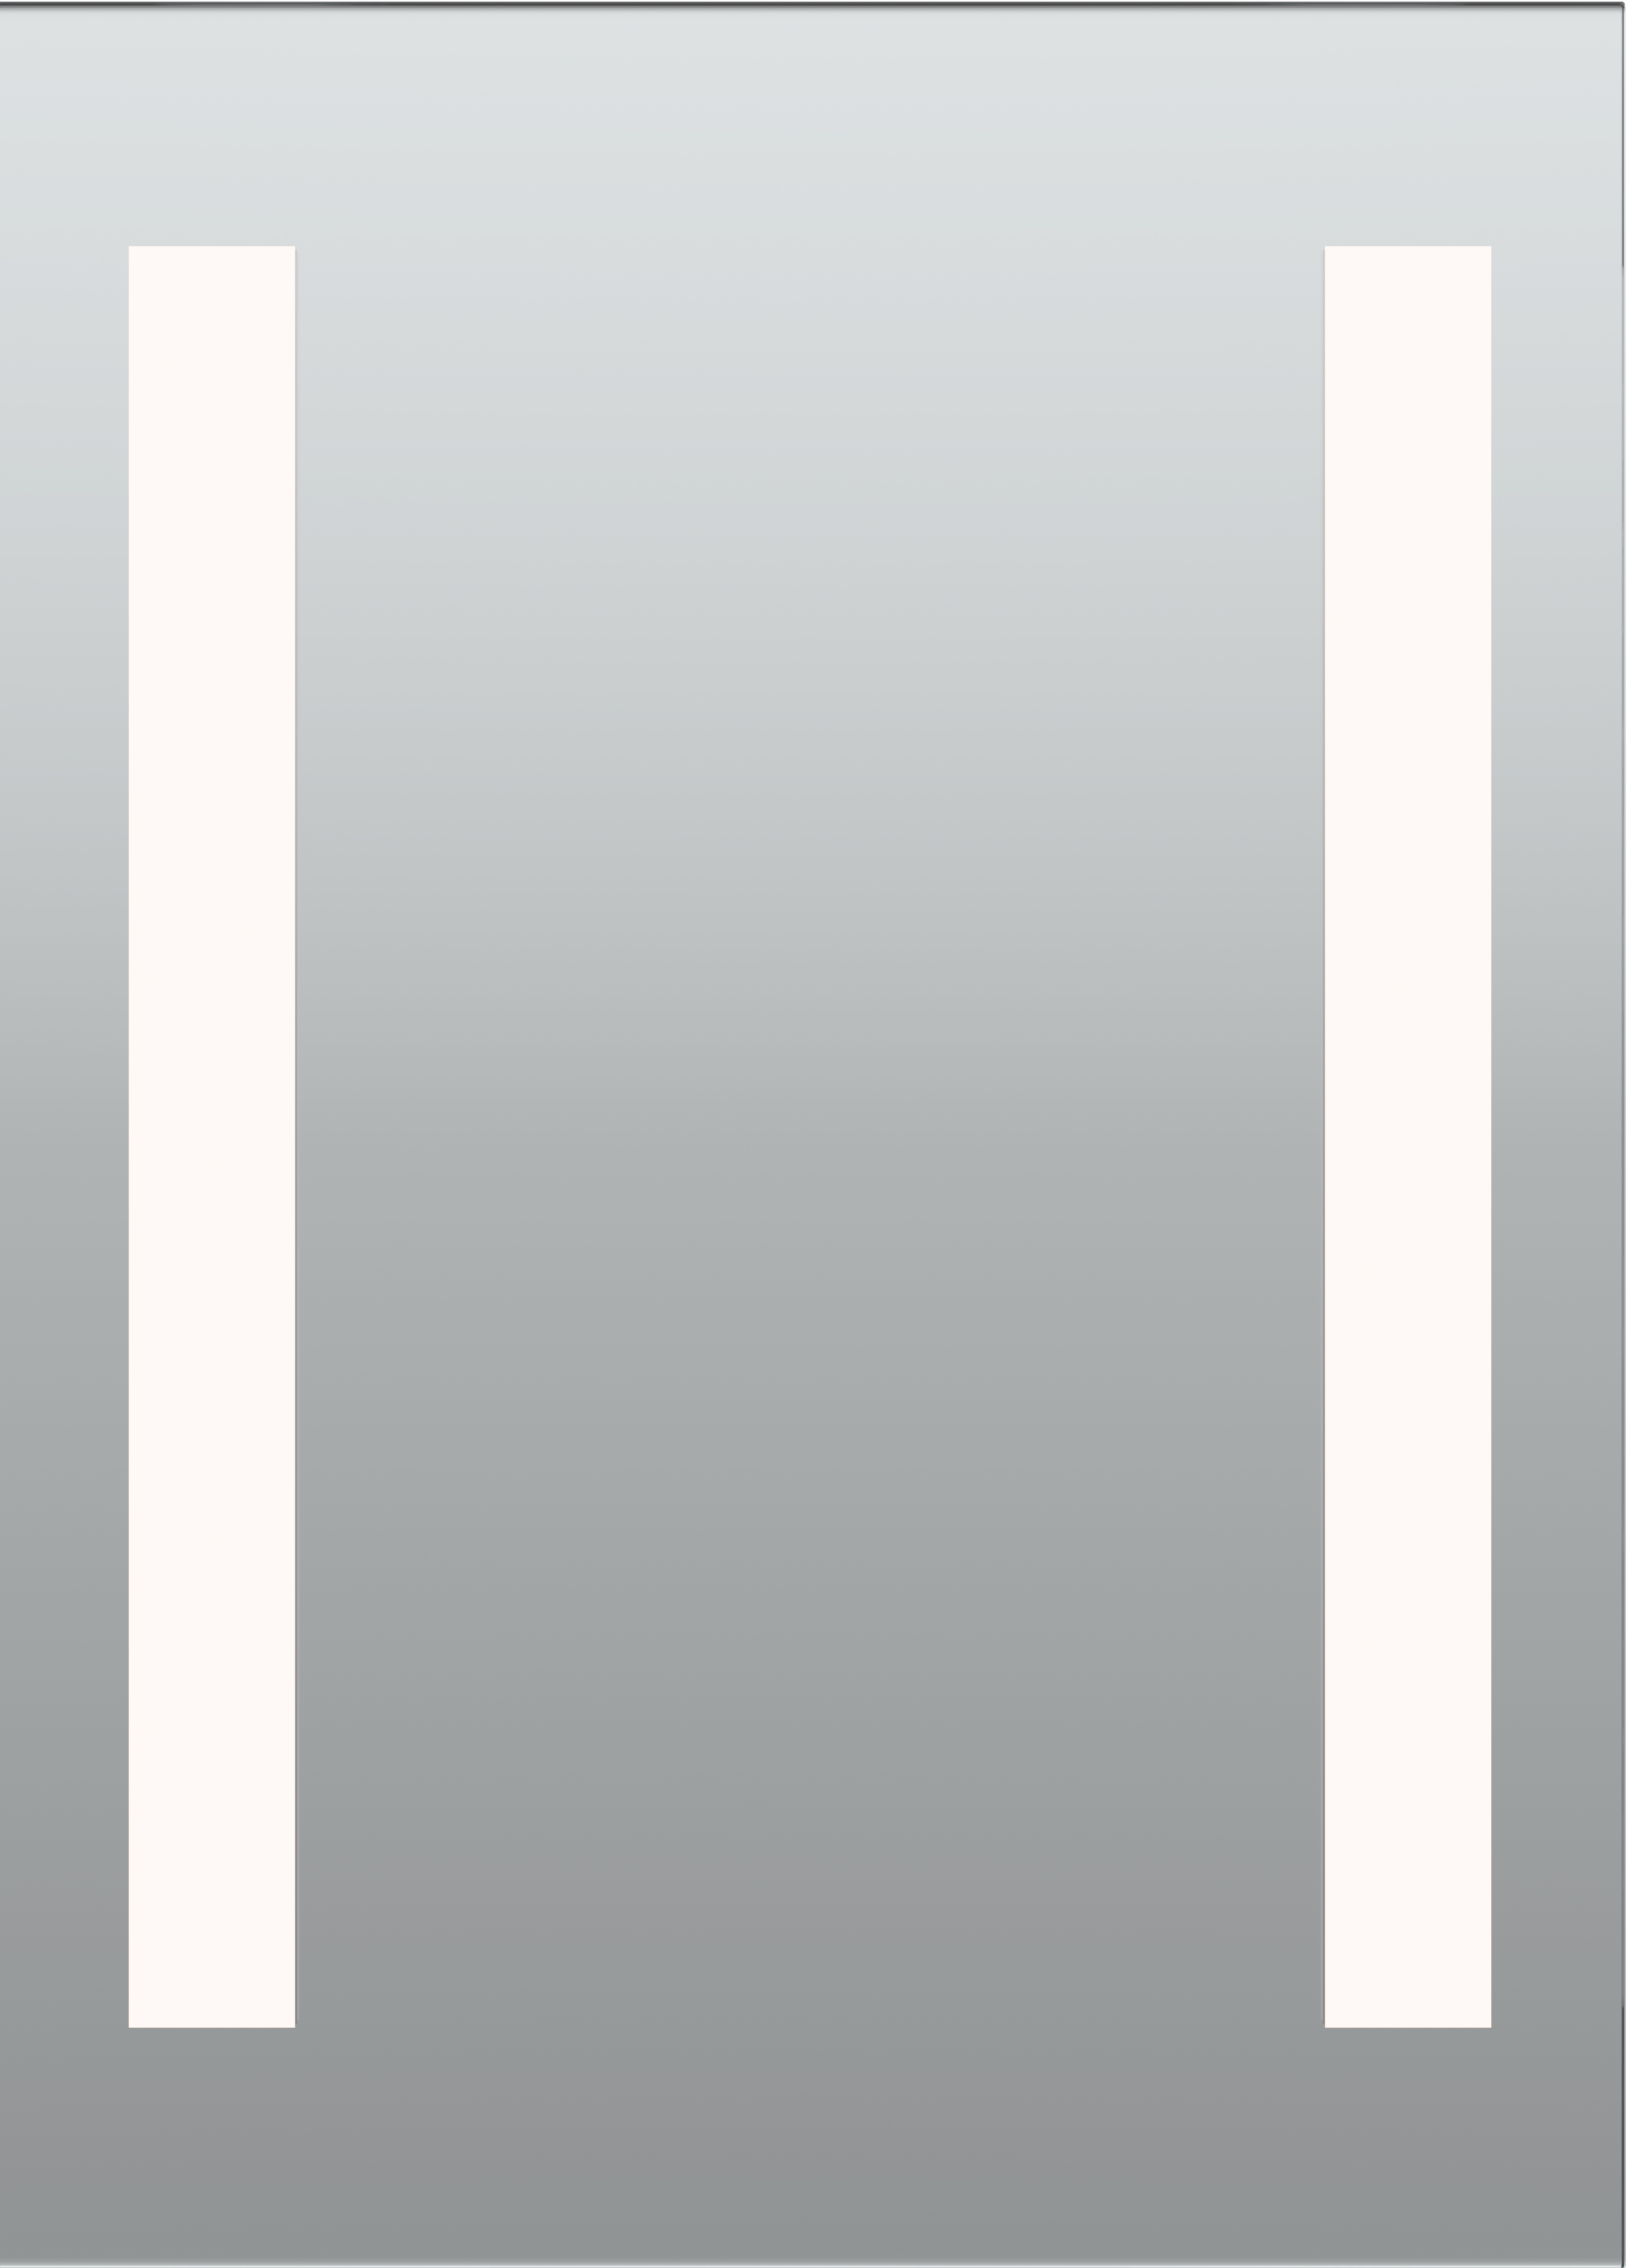 Twin Slim Surface Mount Led Mirror By Pureedge Lighting Twinslim 20 27k